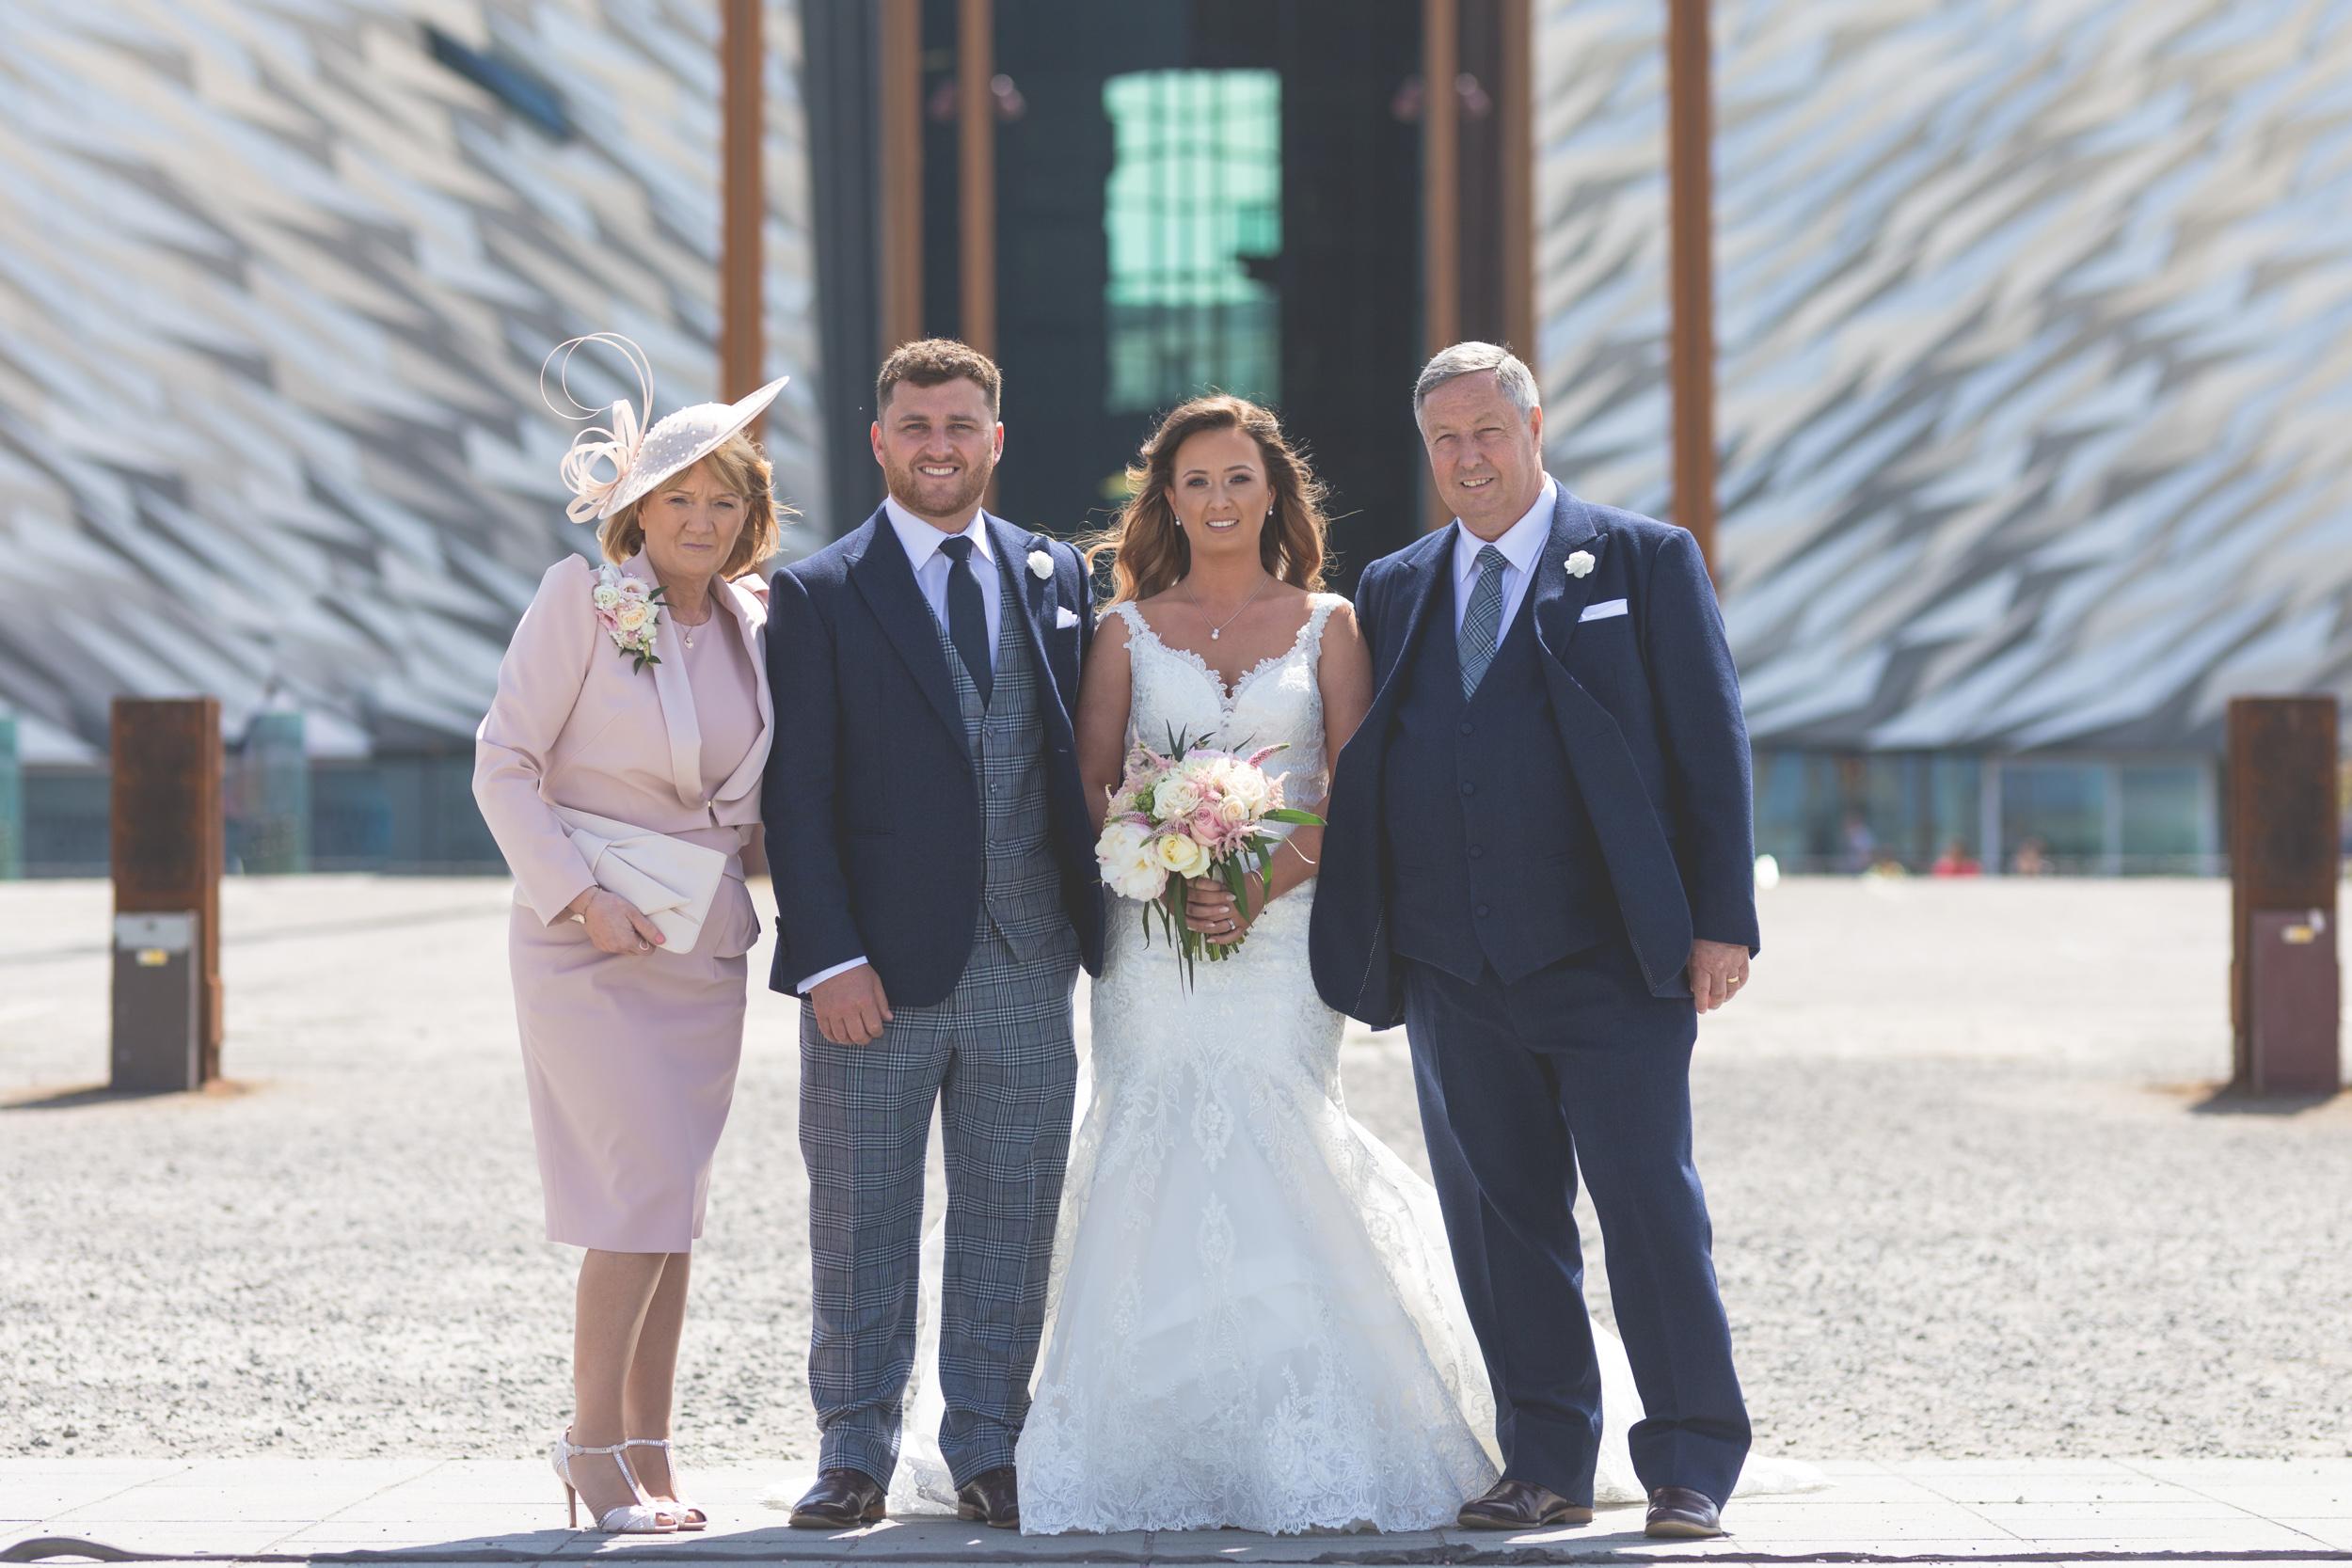 Brian McEwan   Northern Ireland Wedding Photographer   Rebecca & Michael   Portraits-30.jpg